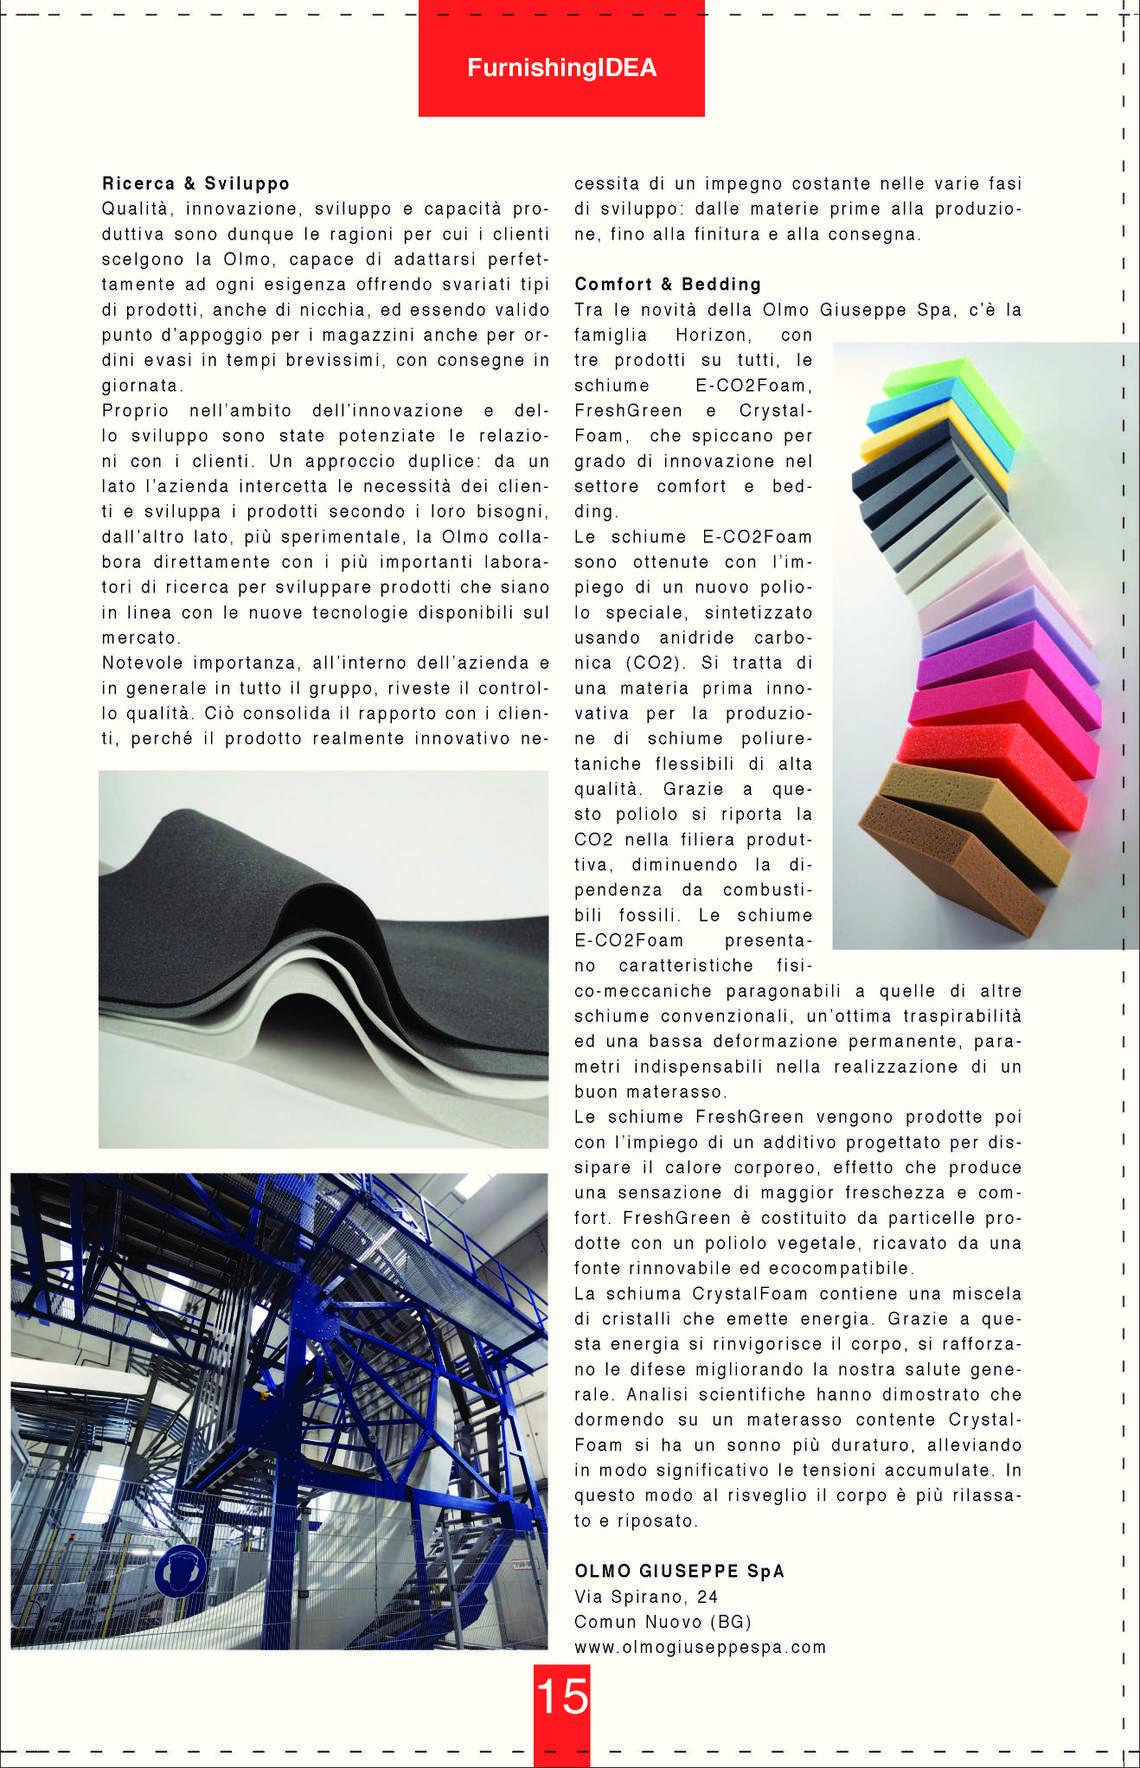 furnishing-idea-journal--1-2018_journal_9_014.jpg